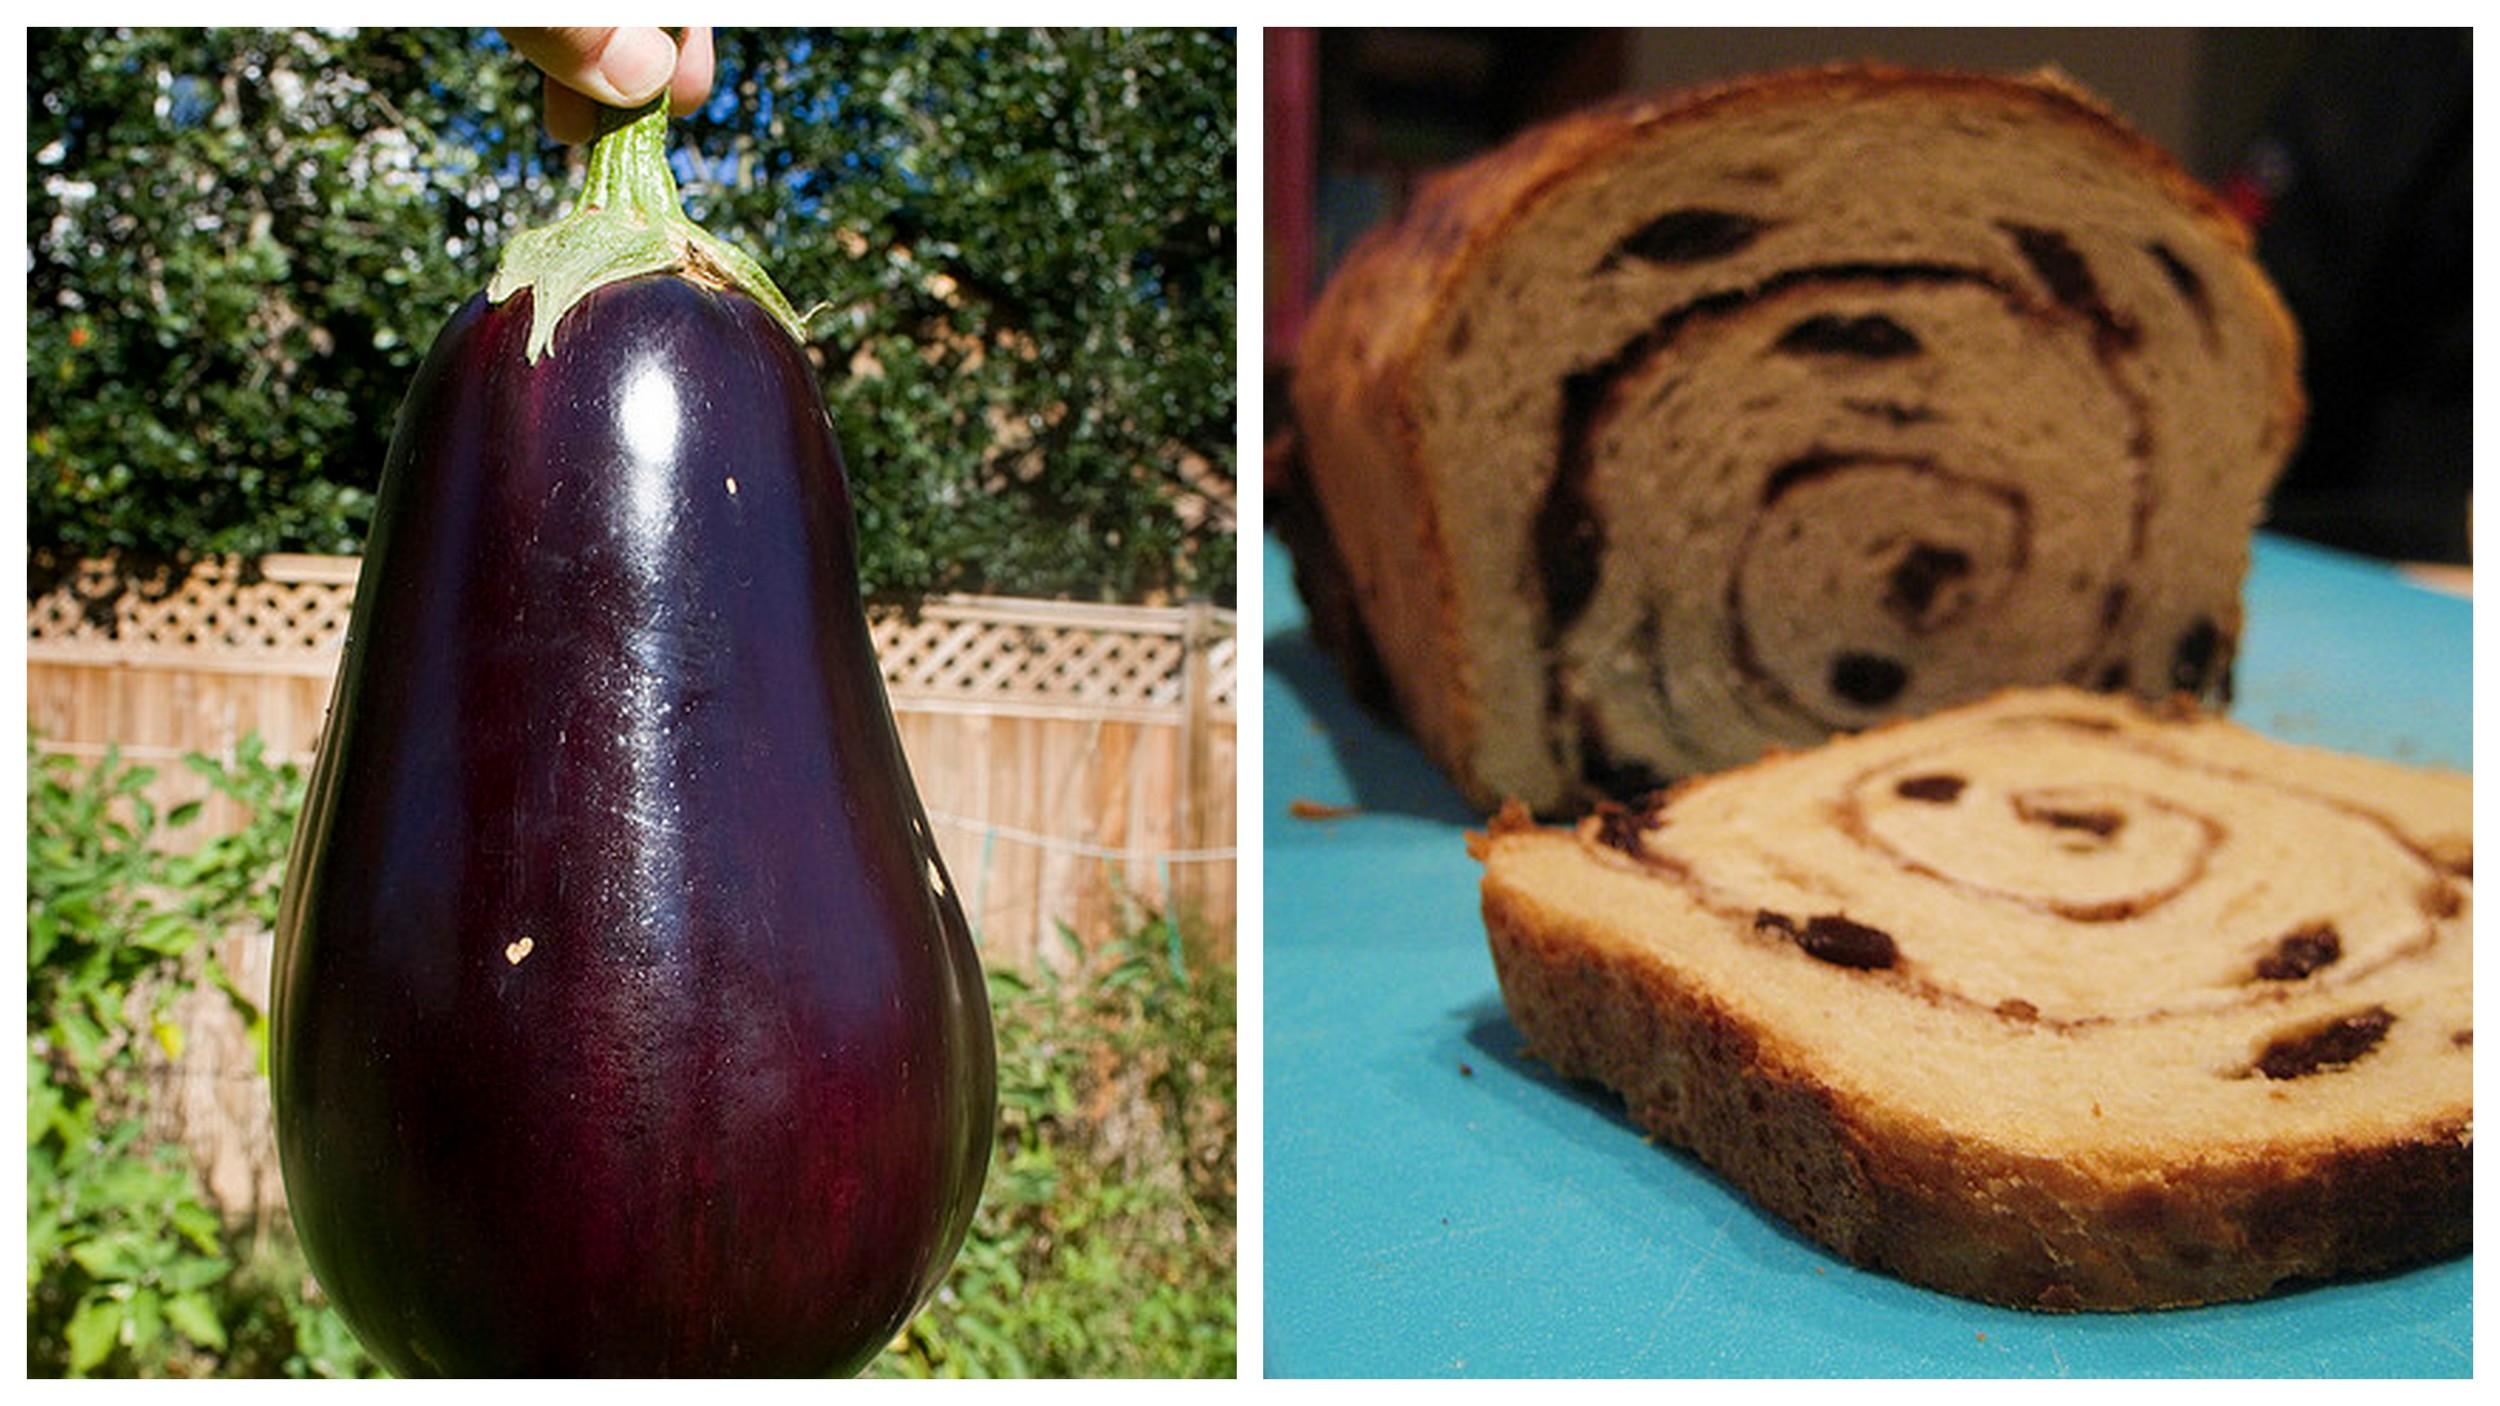 Eggplant    and    Cinnamon bread   .